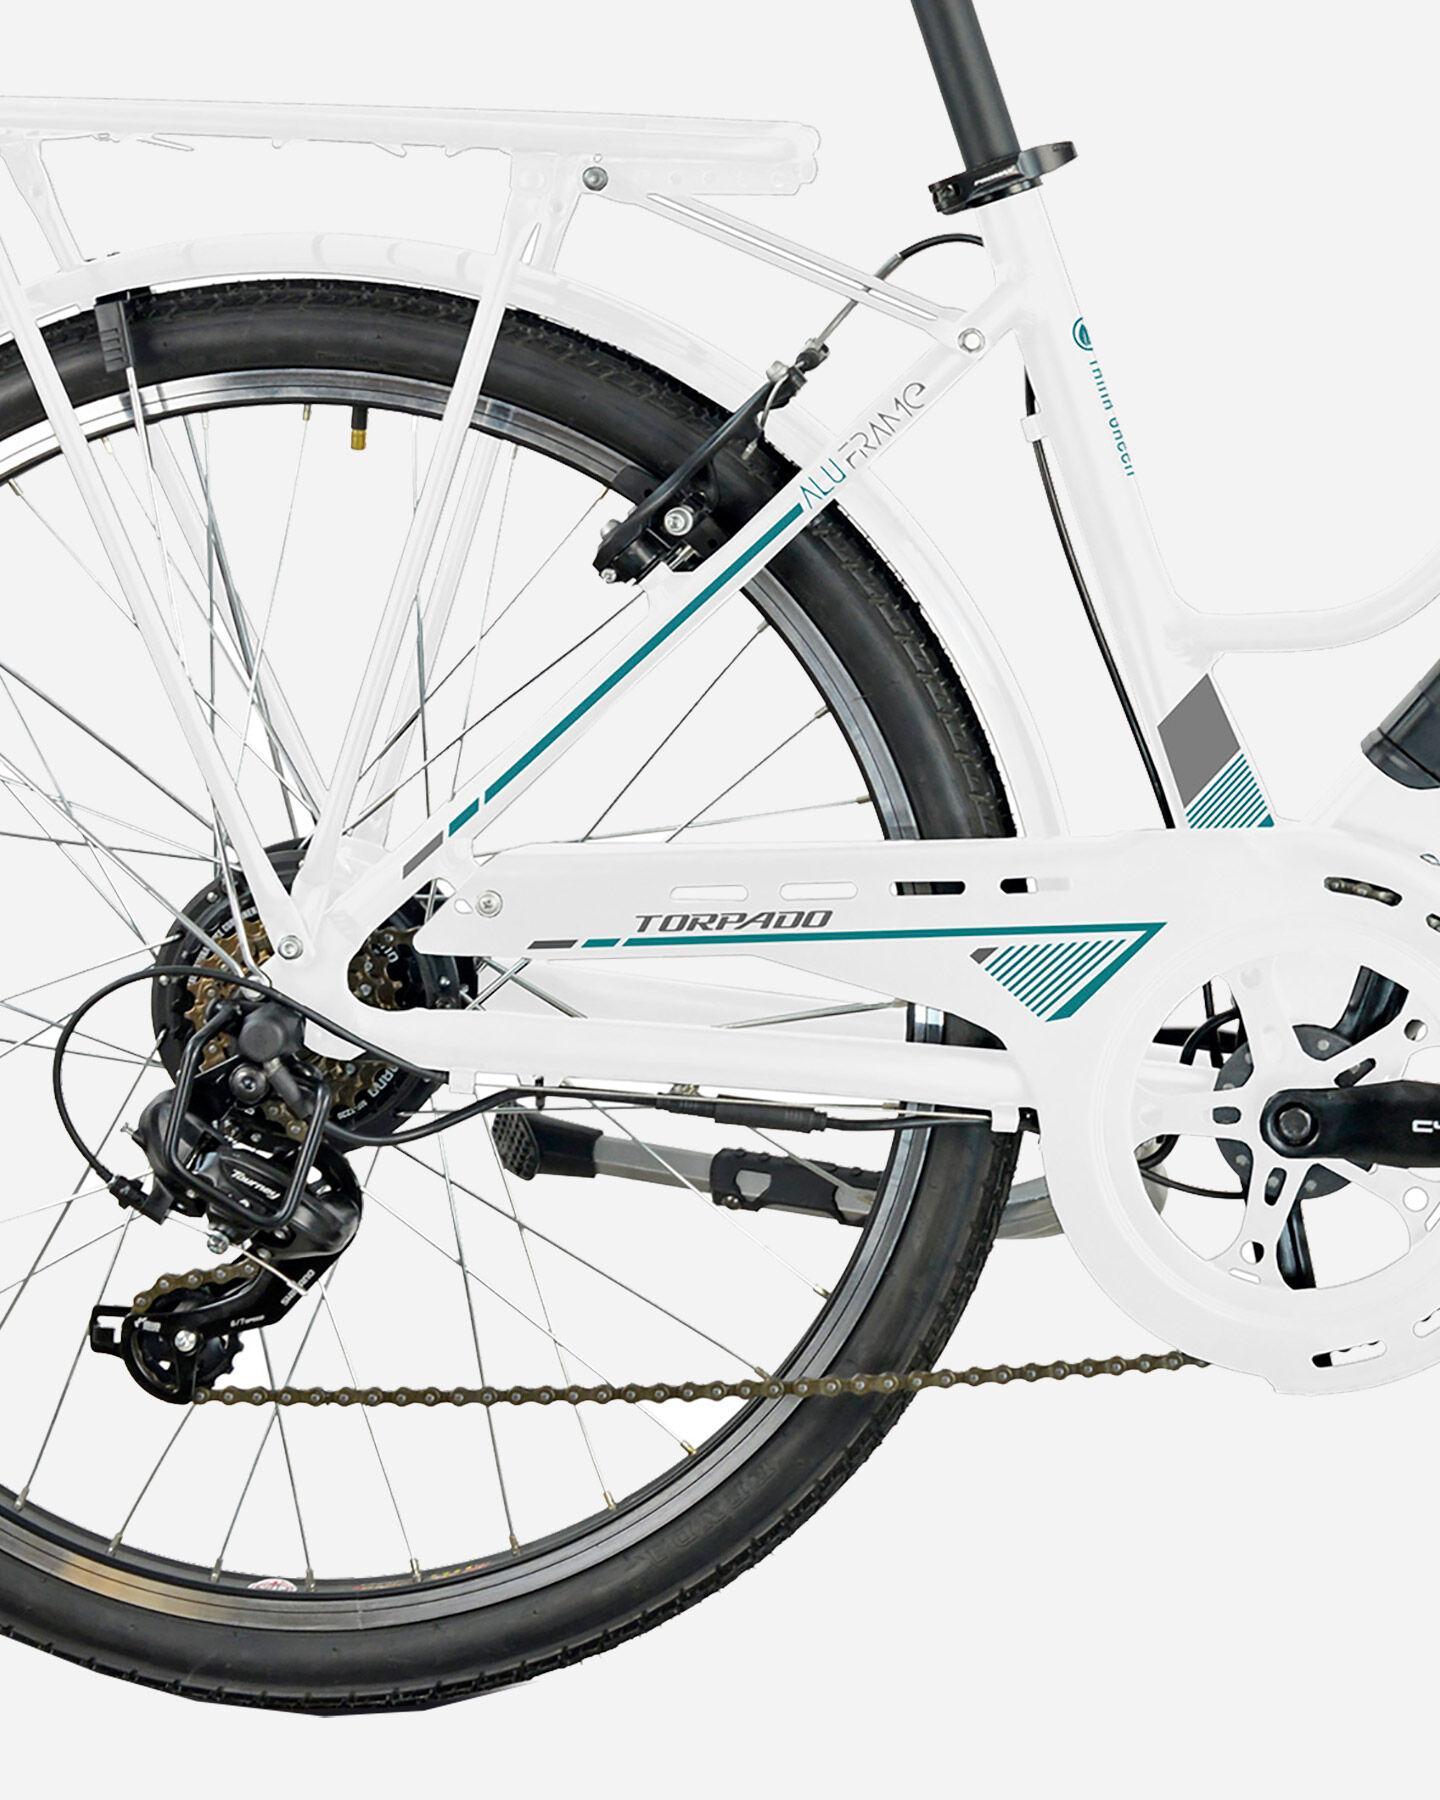 Bici elettrica TORPADO E-BIKE VENUS 7V S4074048 1 UNI scatto 1